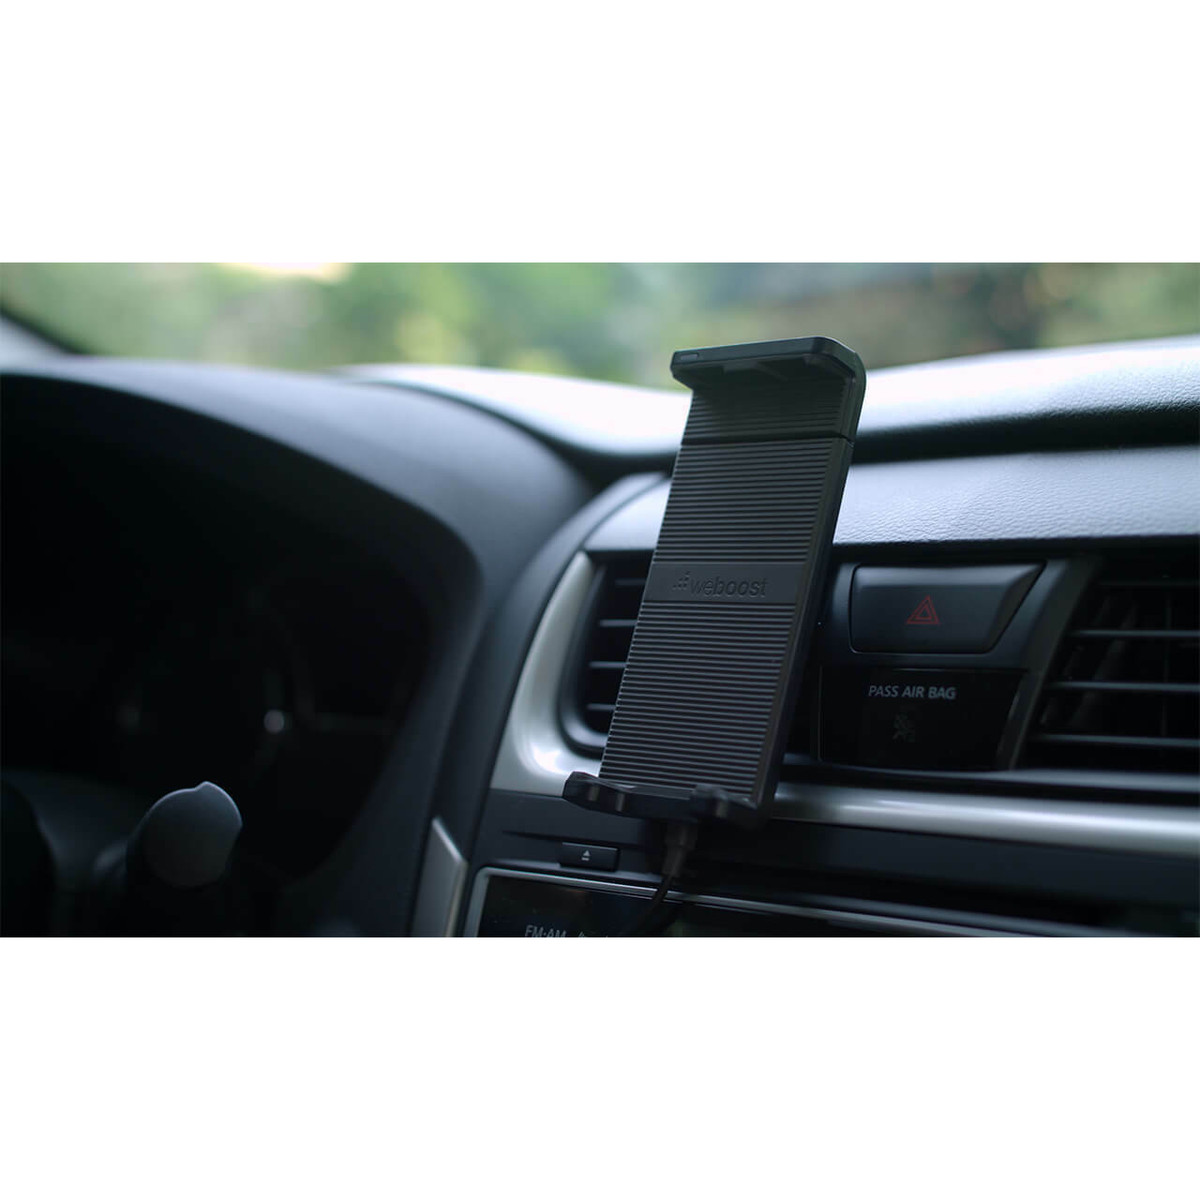 weBoost weBoost Drive Sleek OTR 4G Cell Phone Booster Kit or 470235